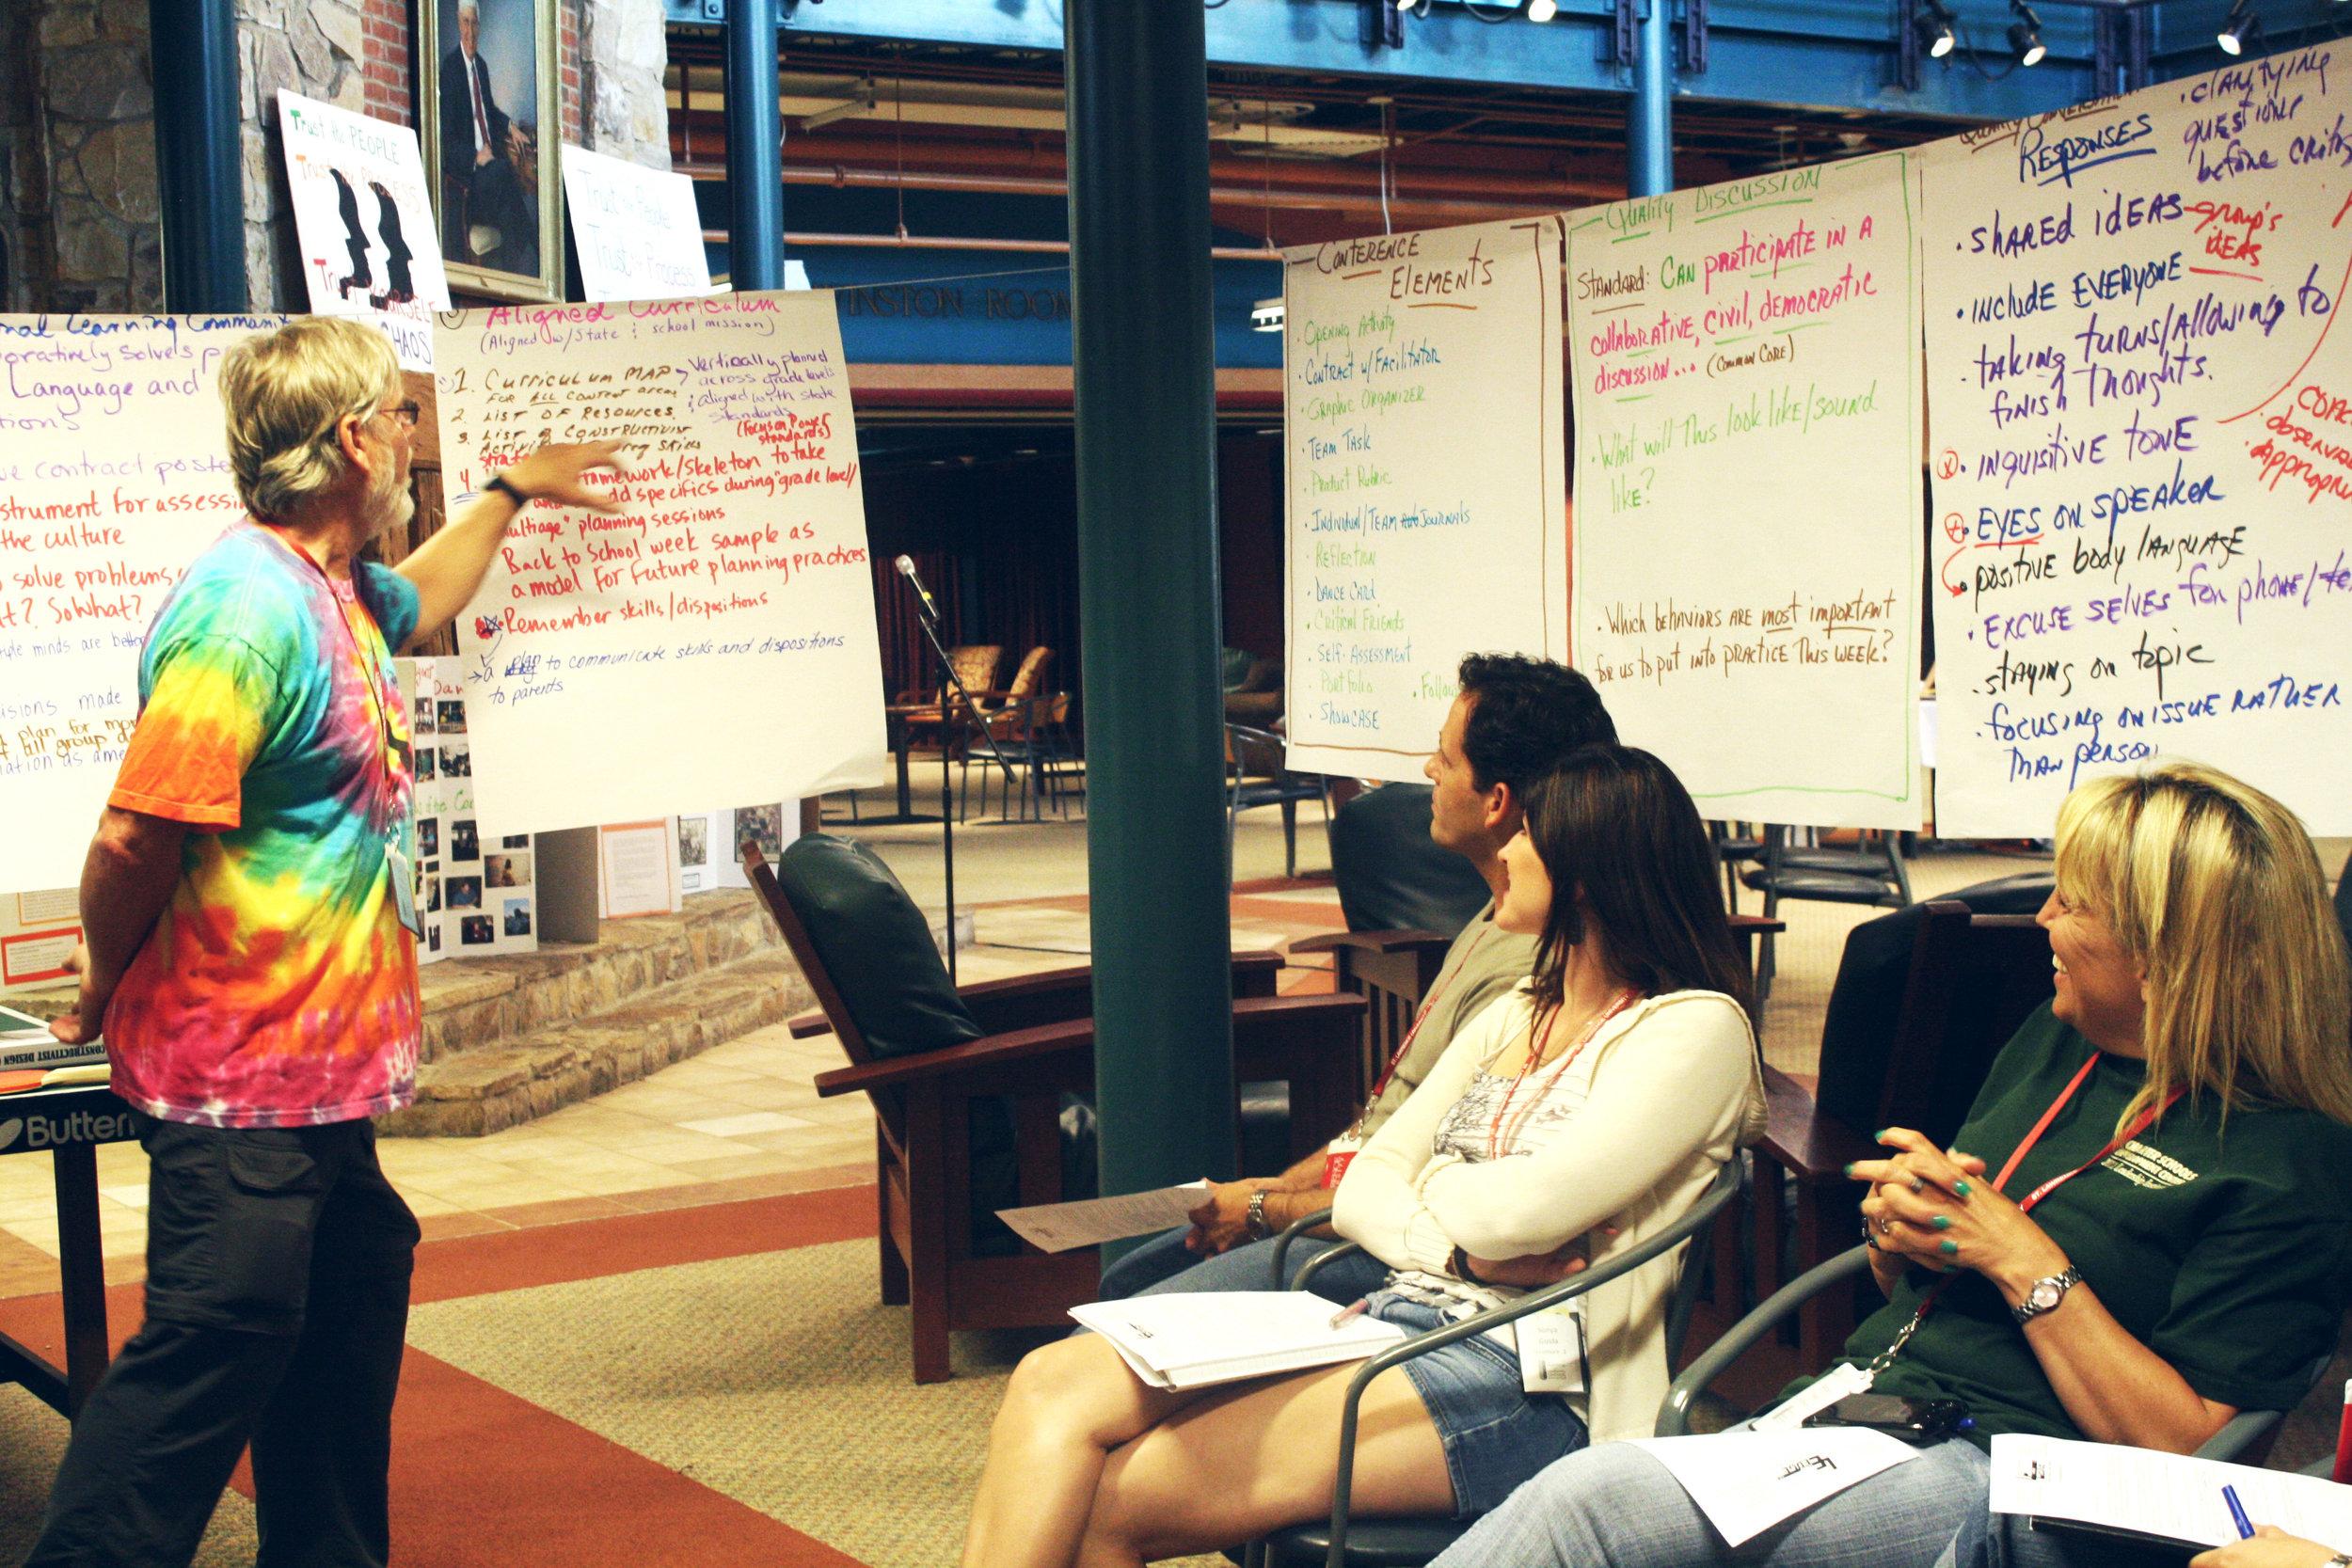 team-work-time-constructivist-conference